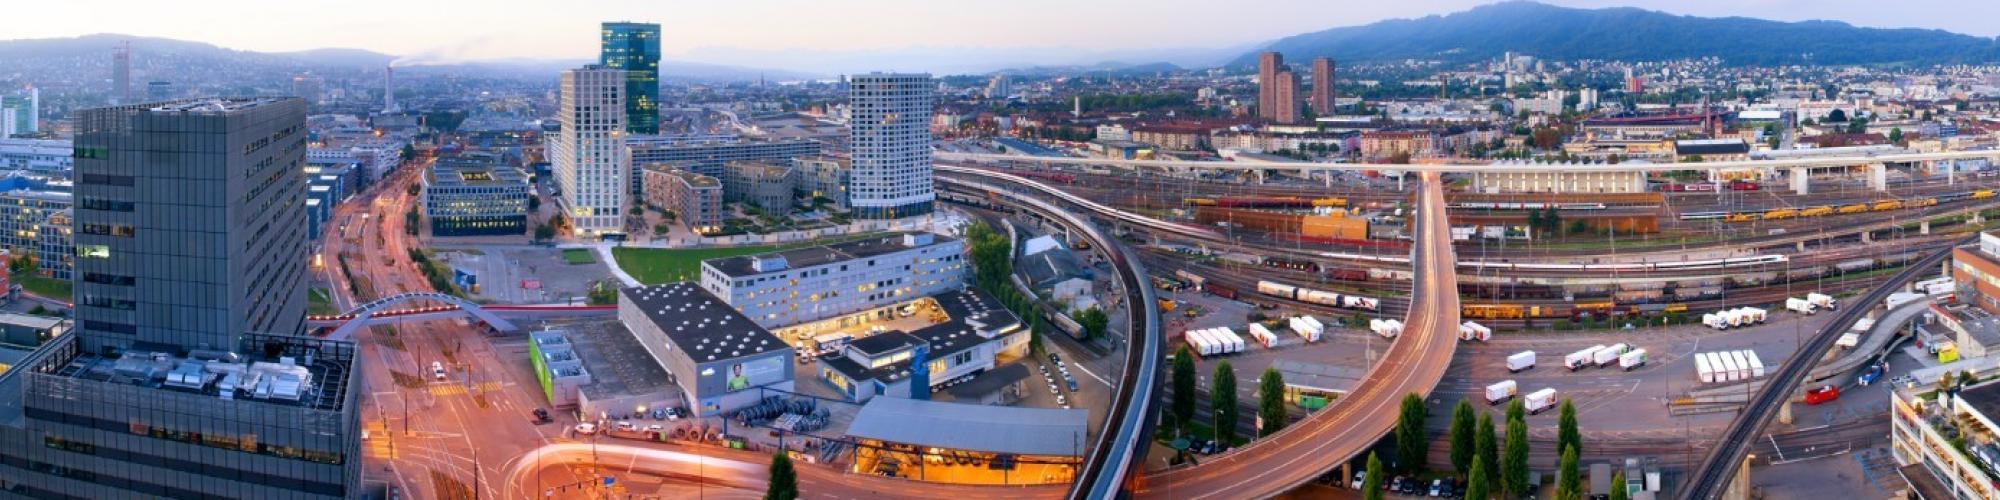 Kantonale Verwaltung Zürich